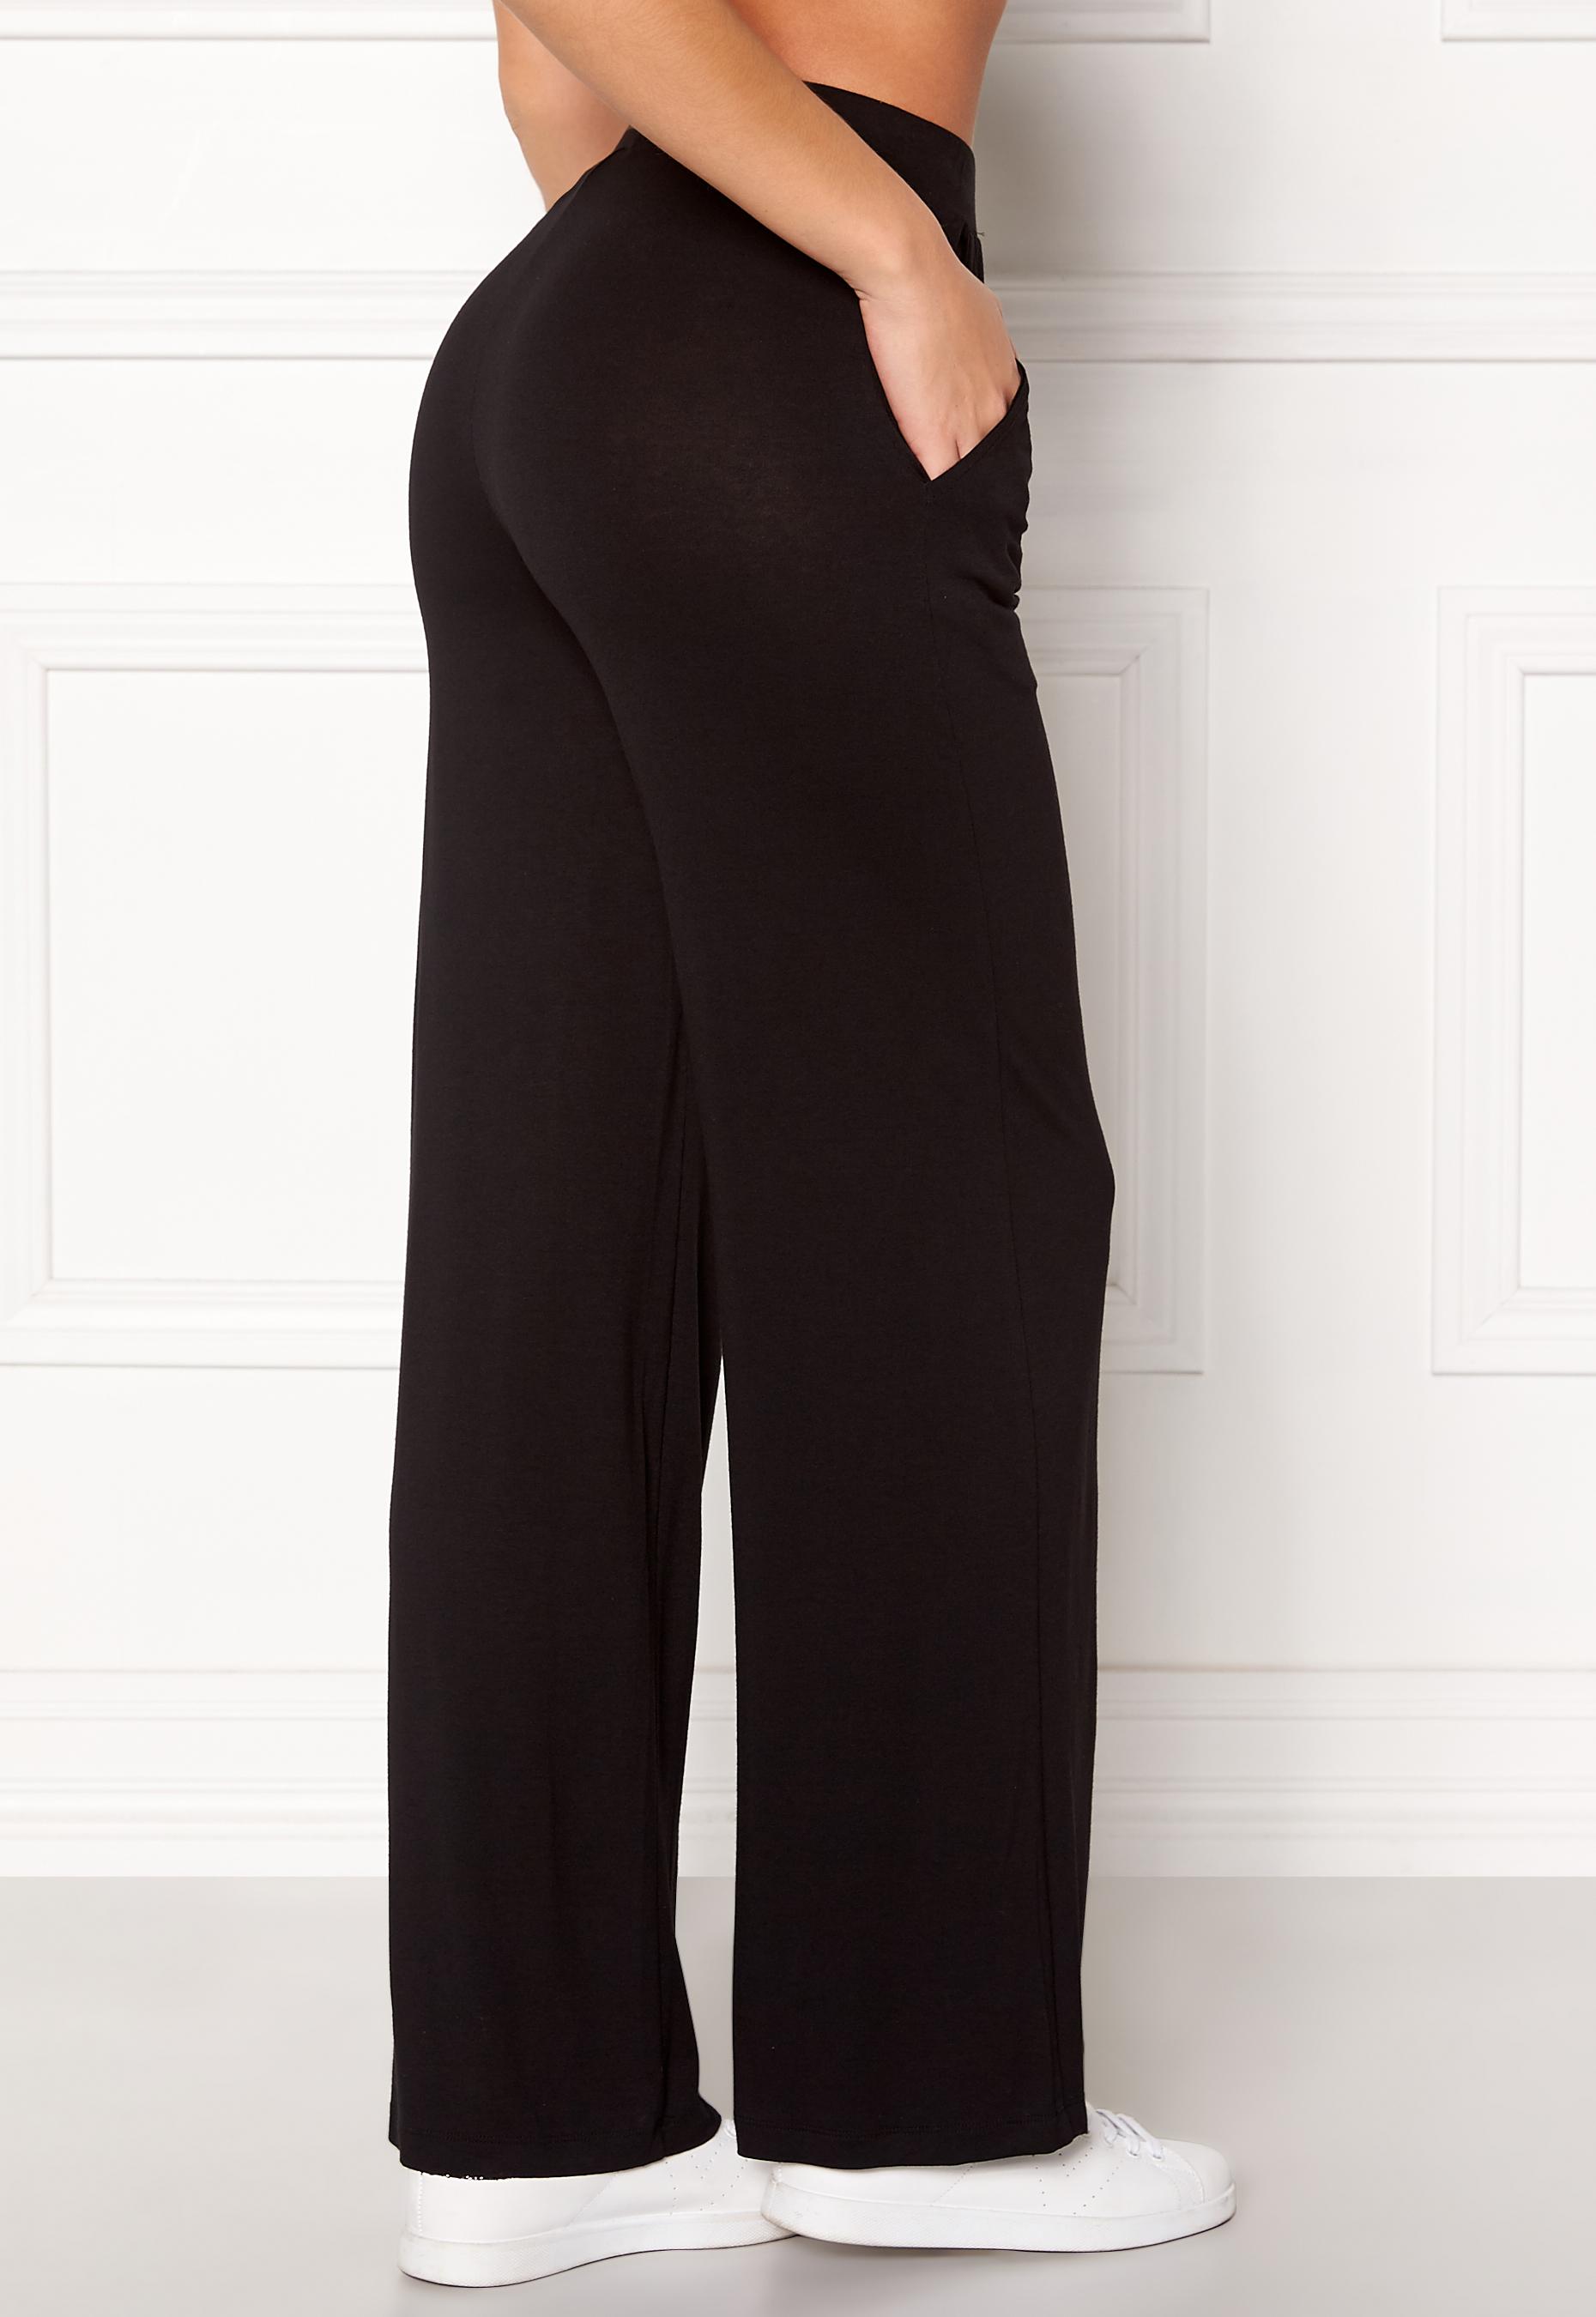 4a232567 77thFLEA Alanya trousers Black - Bubbleroom